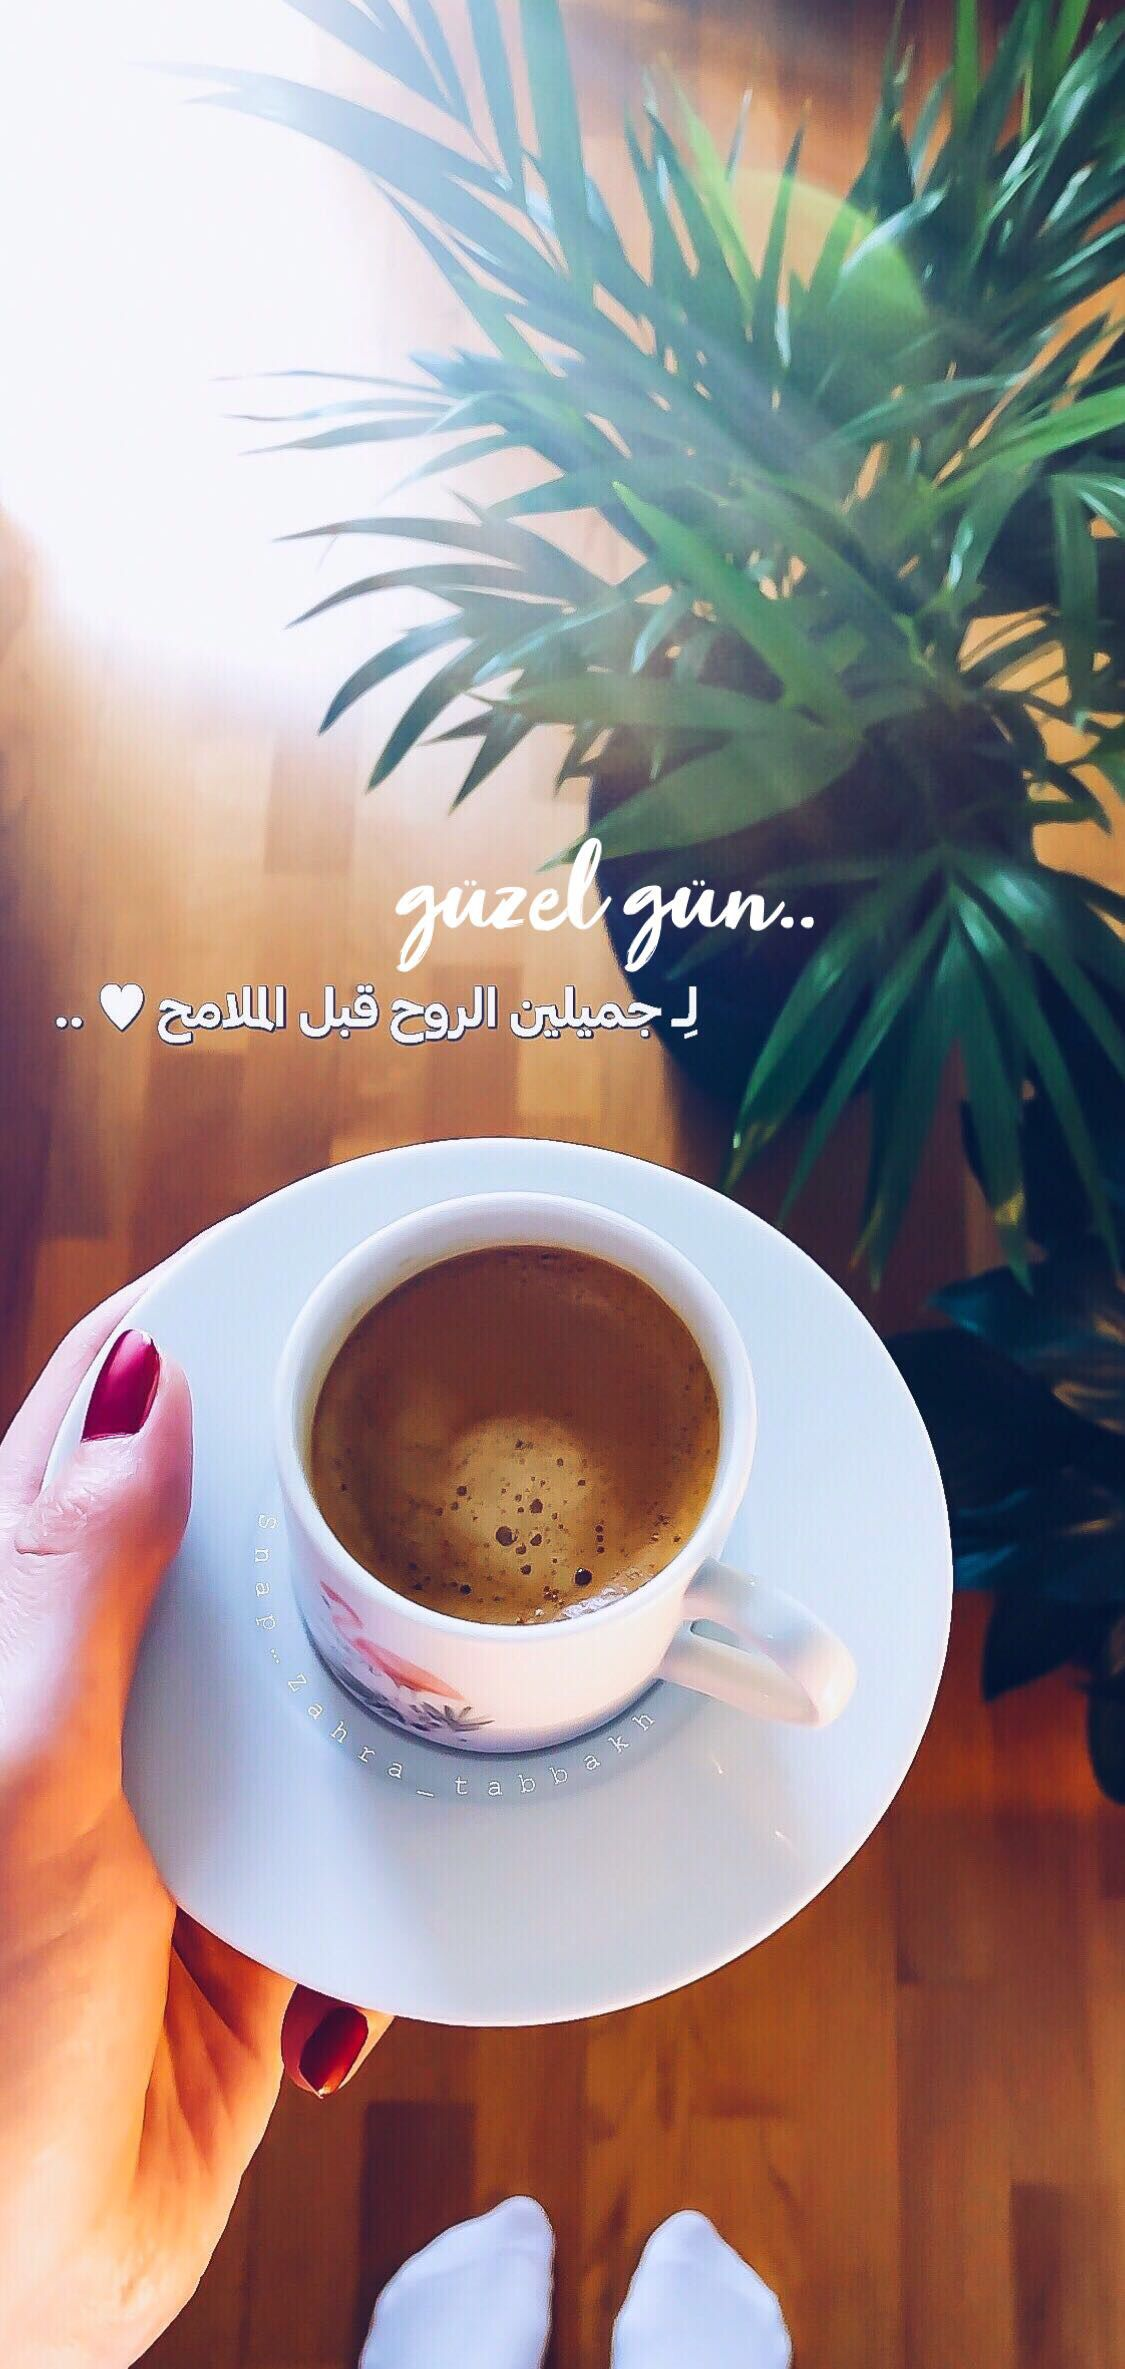 Guzel Gun Enjoy Coffee Late Night Snacks Cool Instagram Pictures